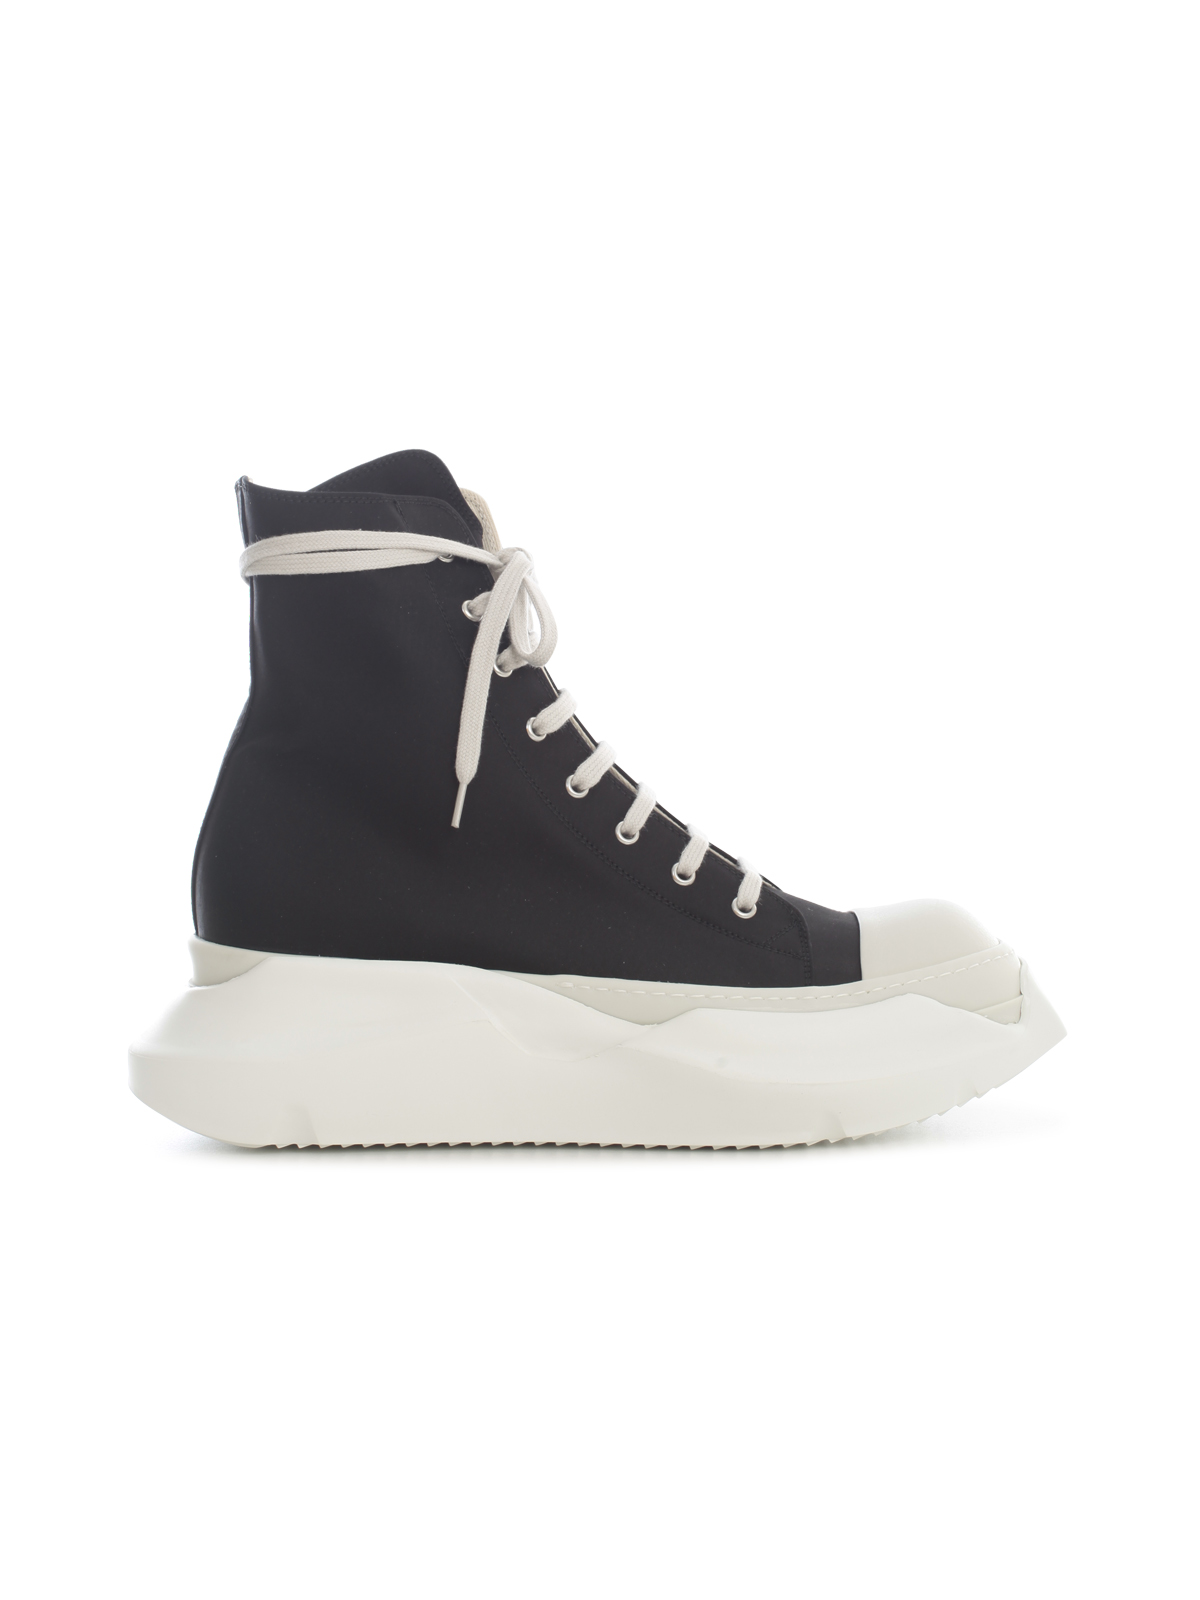 Rick Owens Drkshdw Shoes DU20F1840.CNP